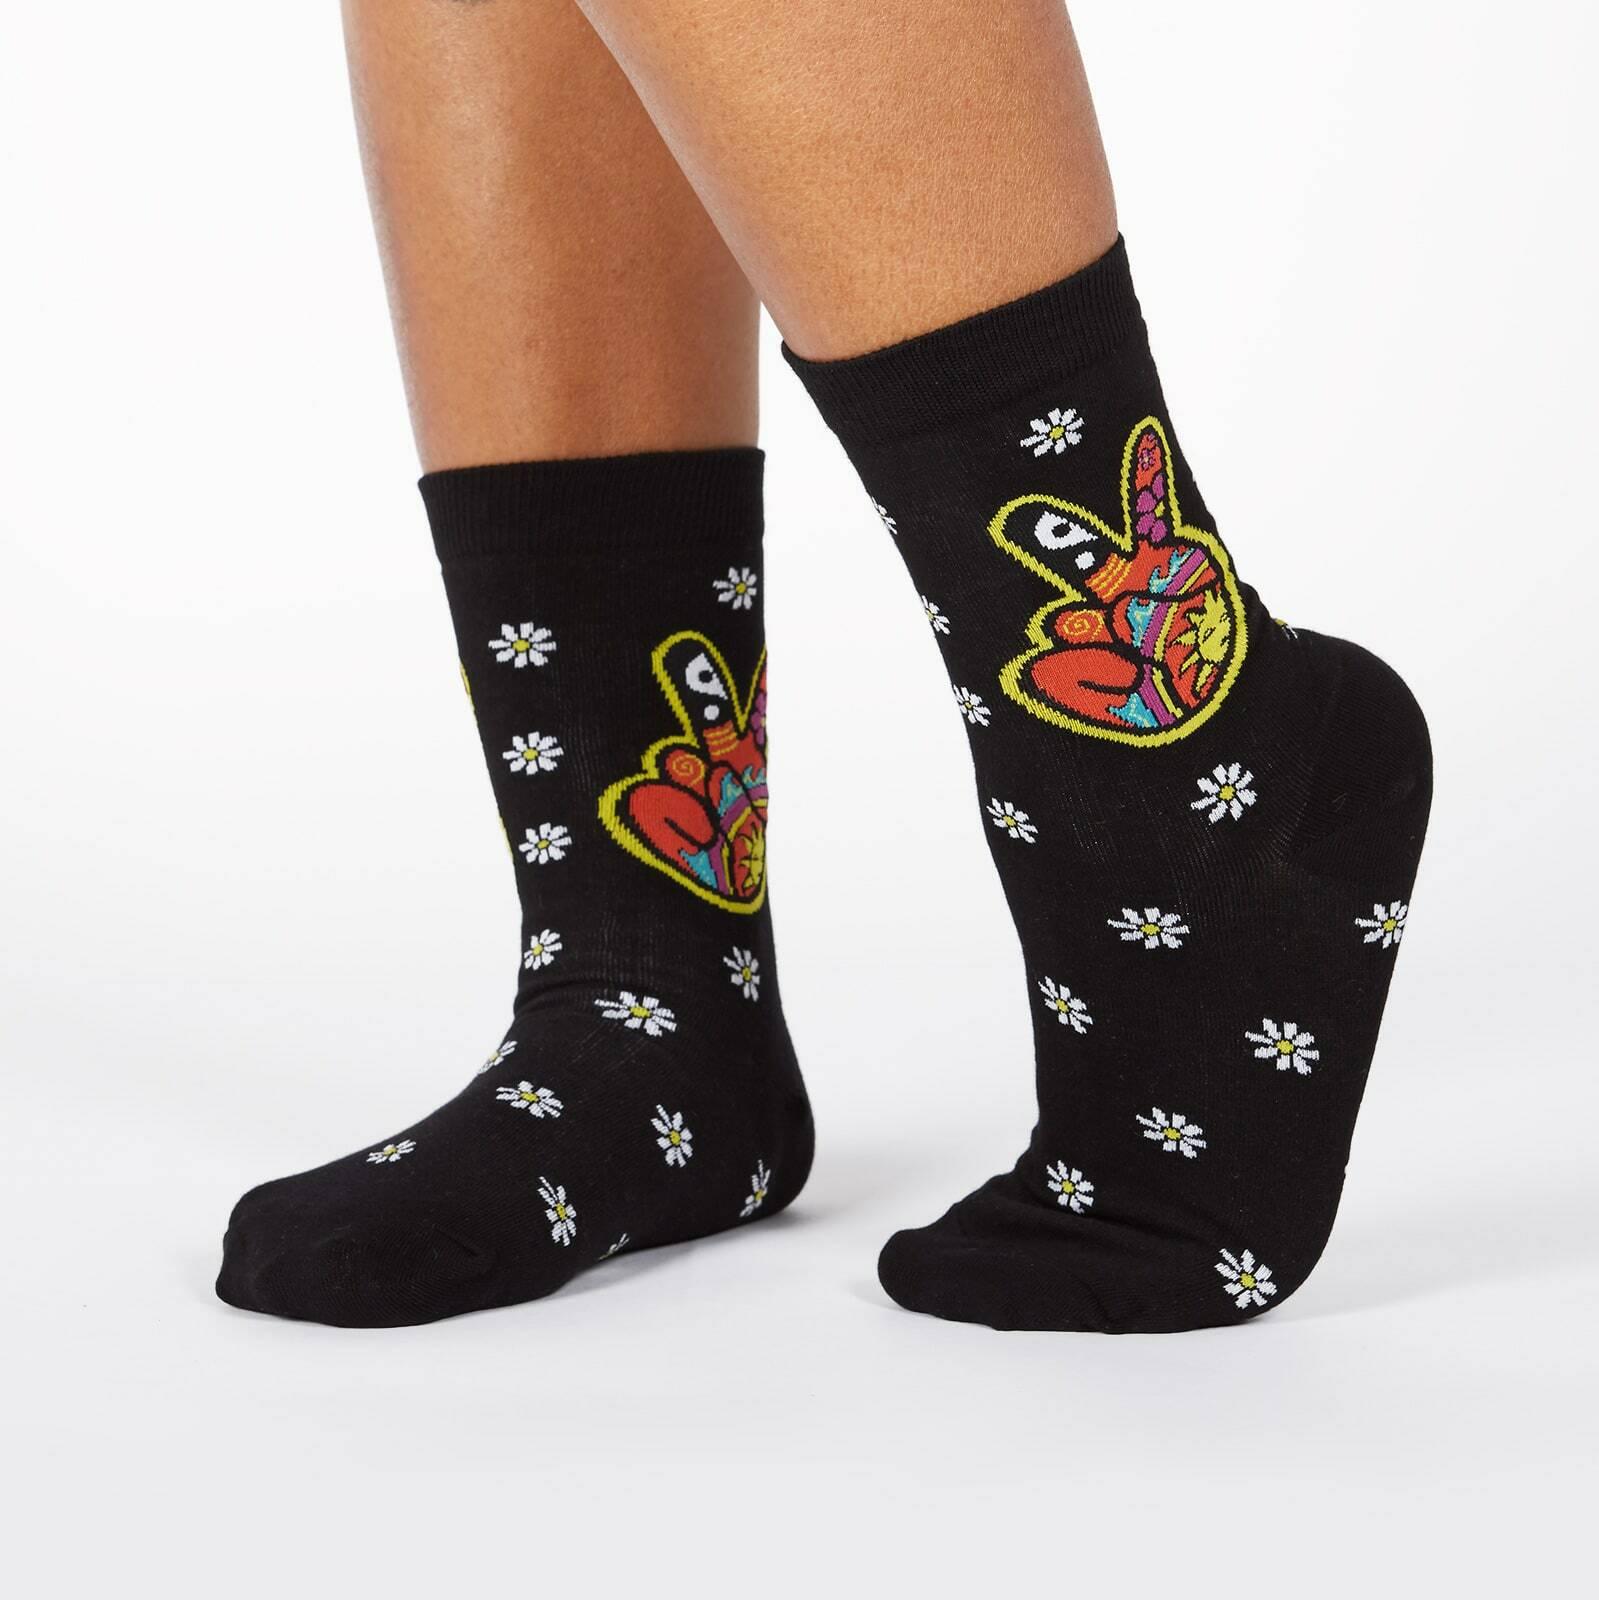 model wearing Dream of the '90s - Nostaglic 90's Kids Peace and Daisy Crew Socks Black - Women's